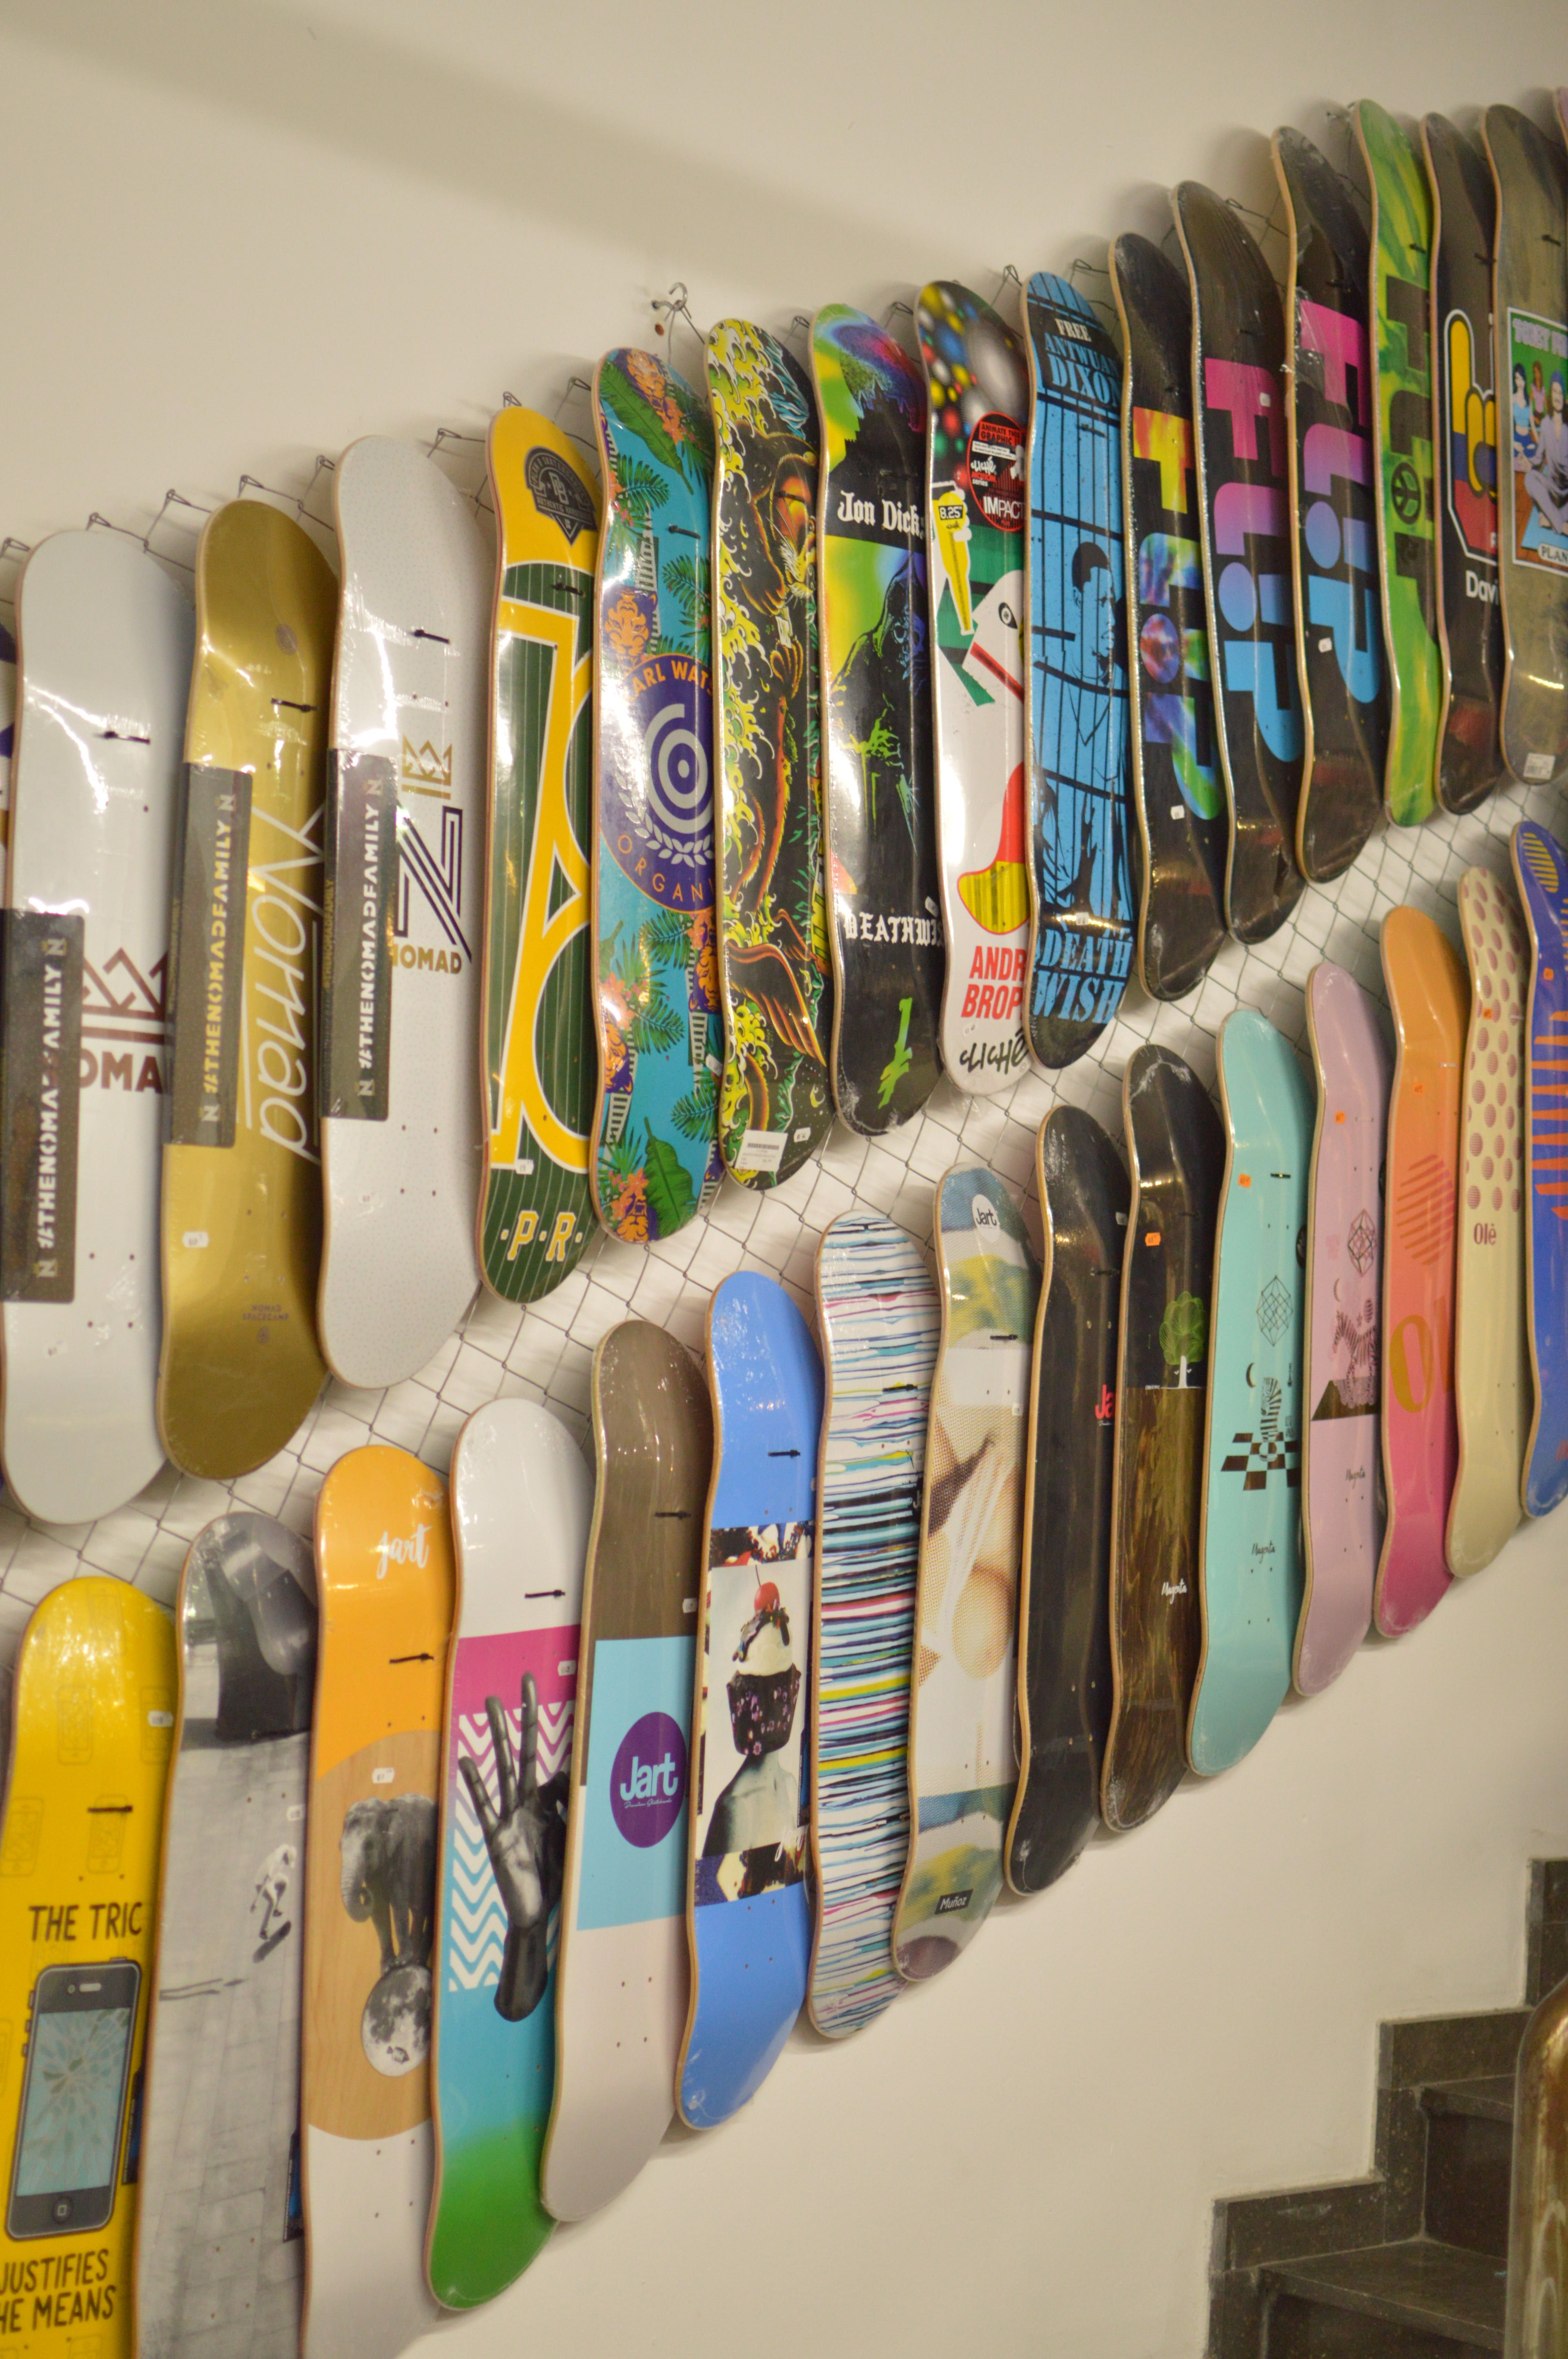 Skate: Nuestra Tienda de Antidot Skate Shop